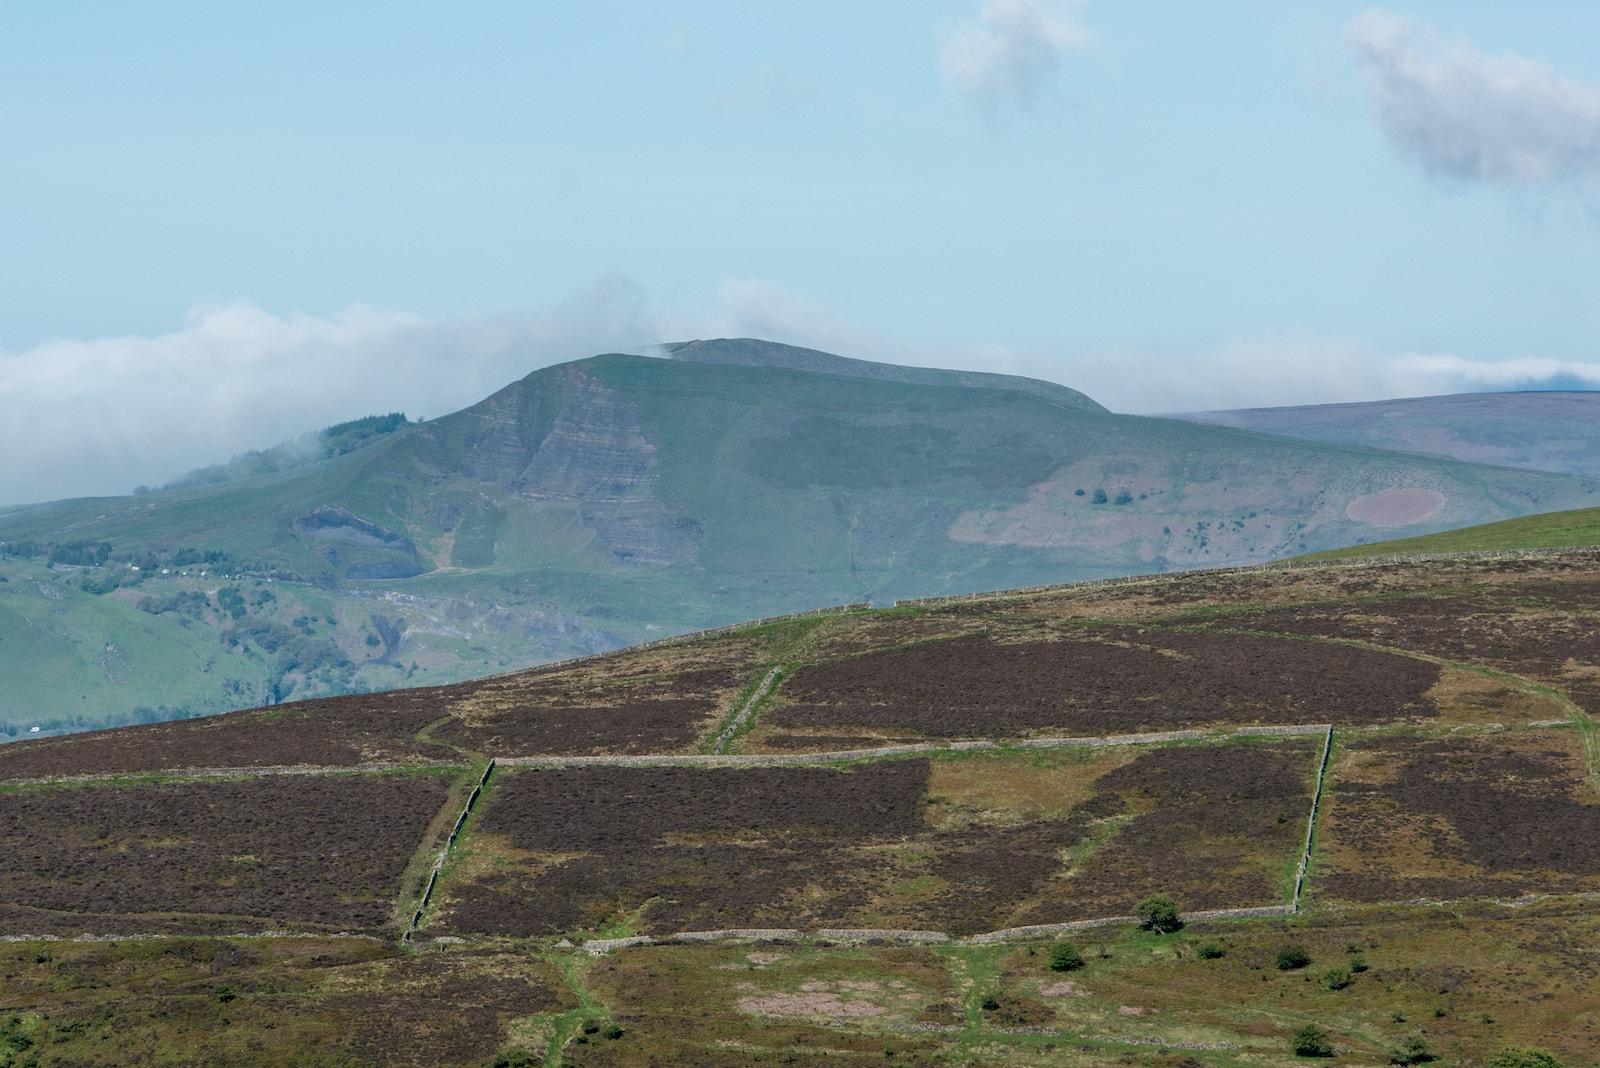 2021 05 2627 Sam Rose RB Peak District Bamford Edge s RGB 300dpi 2000px long 3662